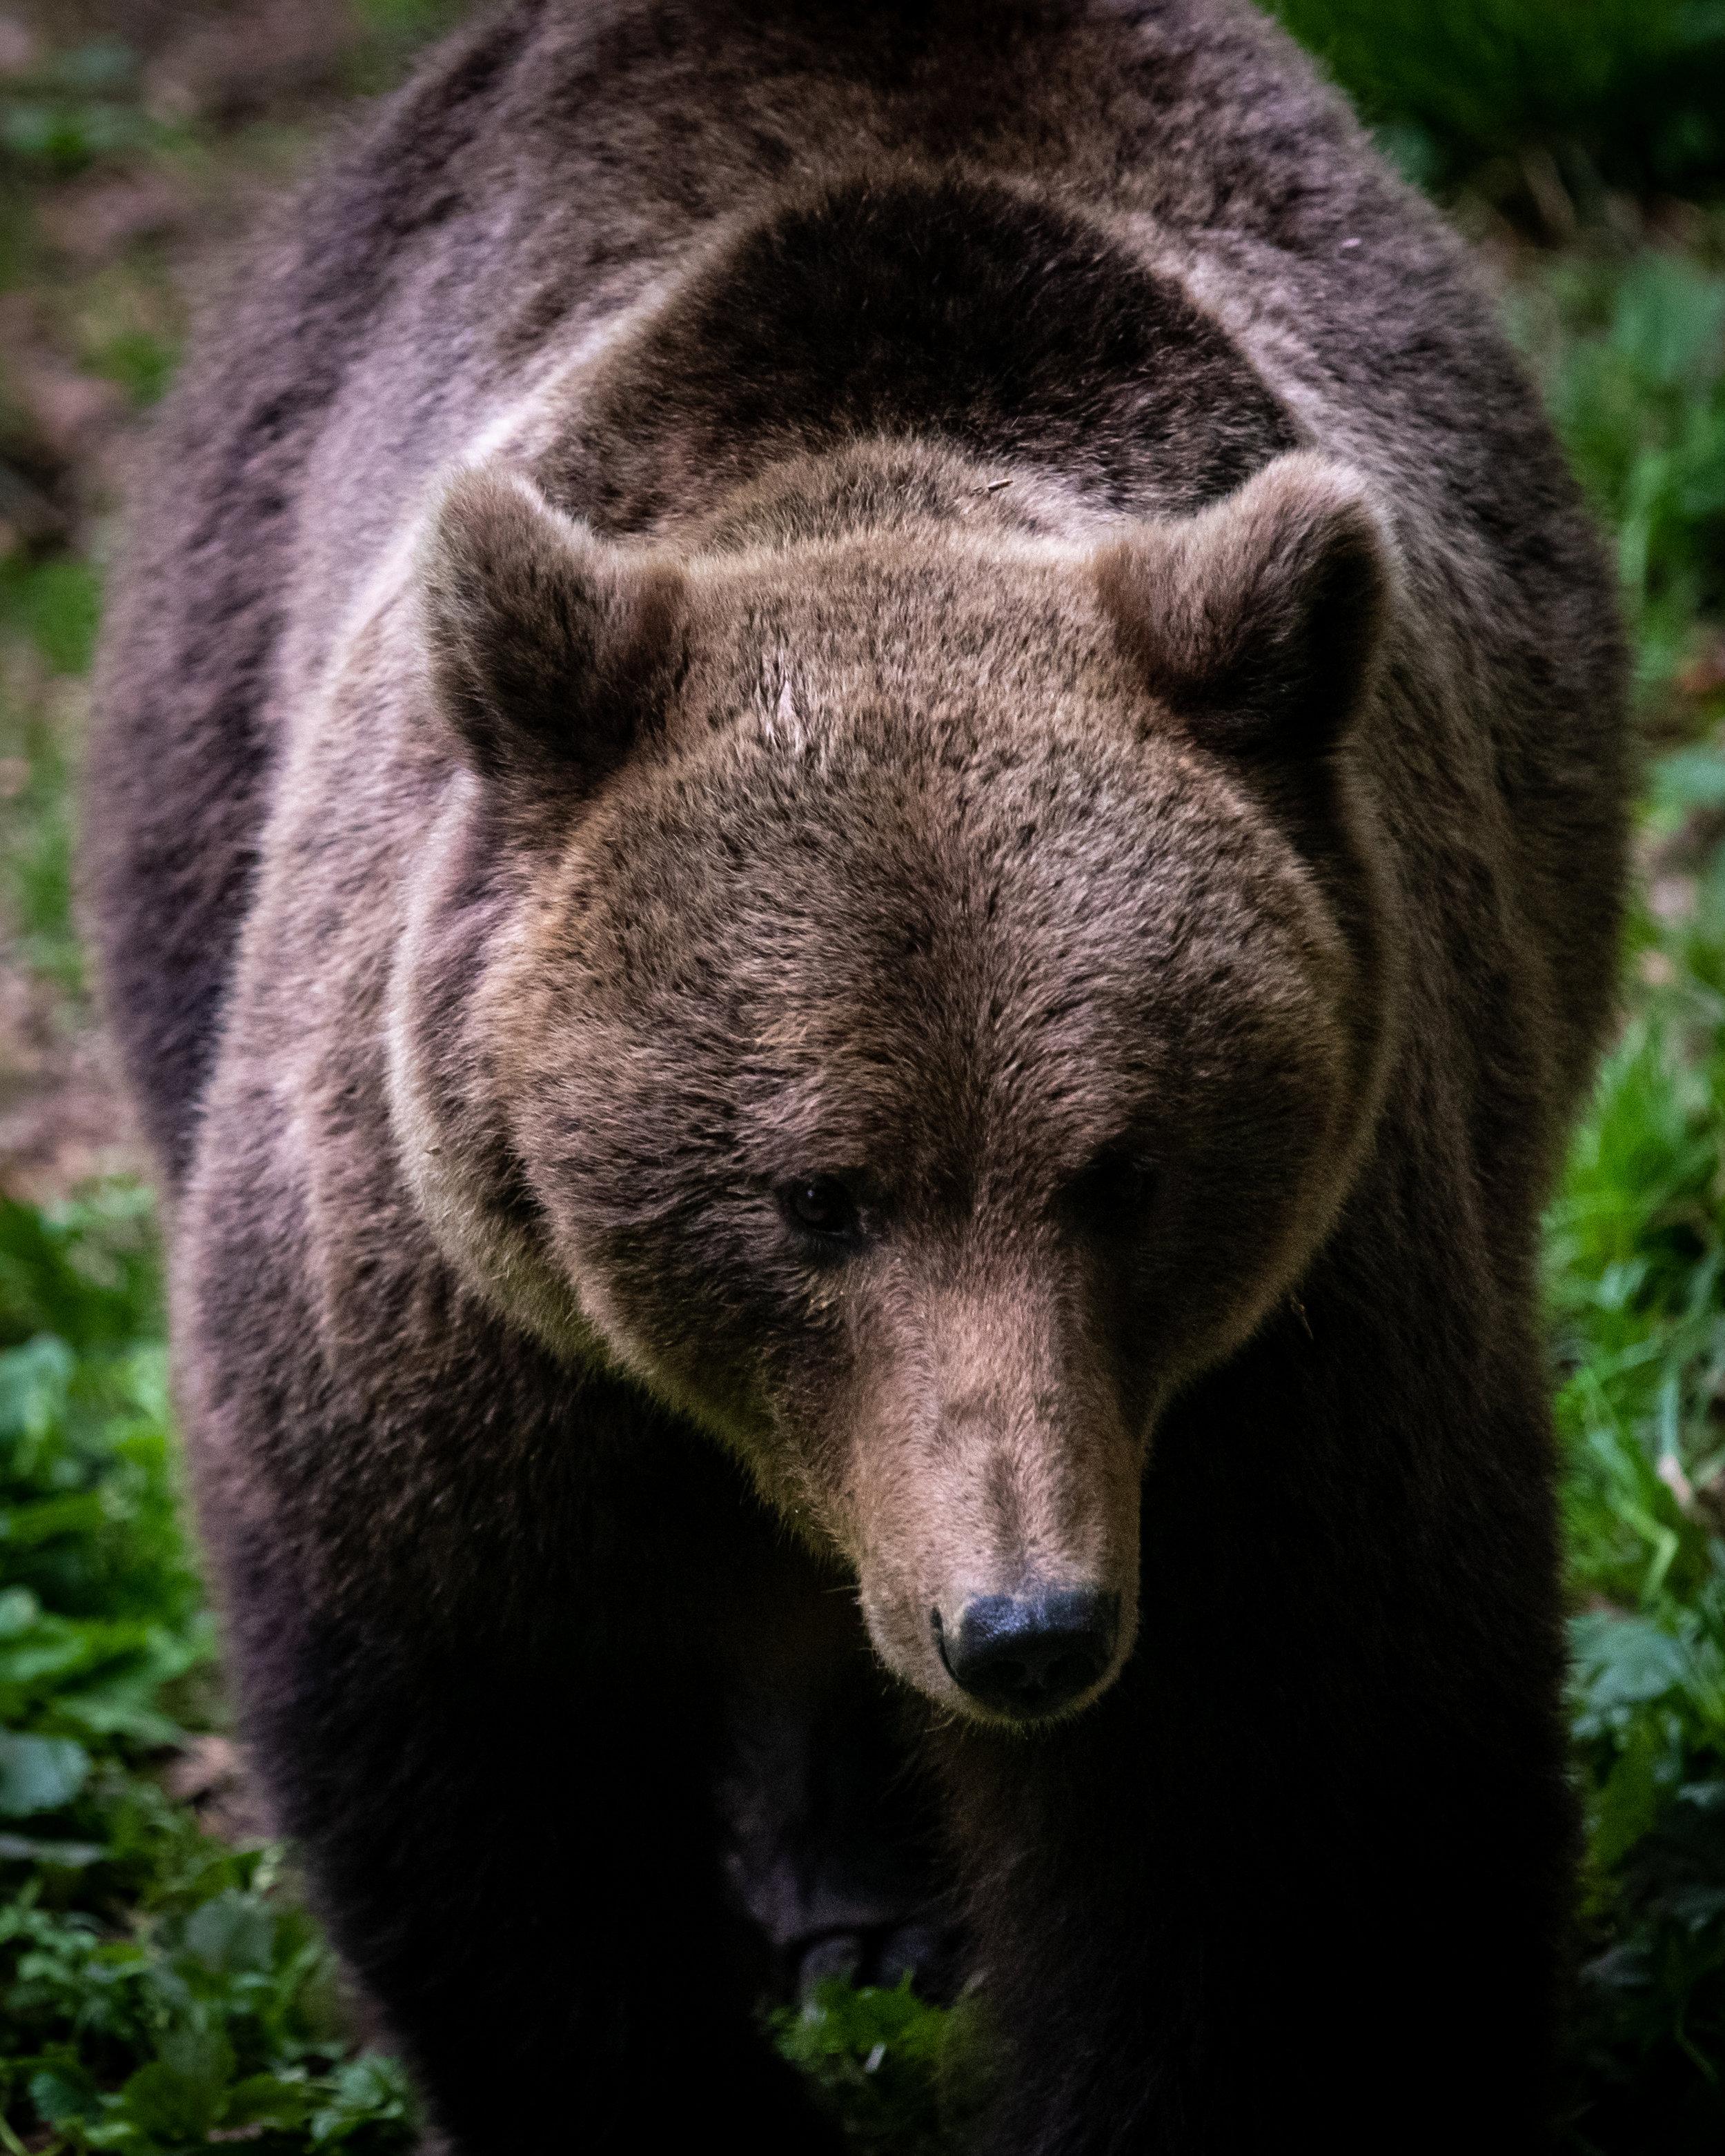 Brown bear in Transylvania